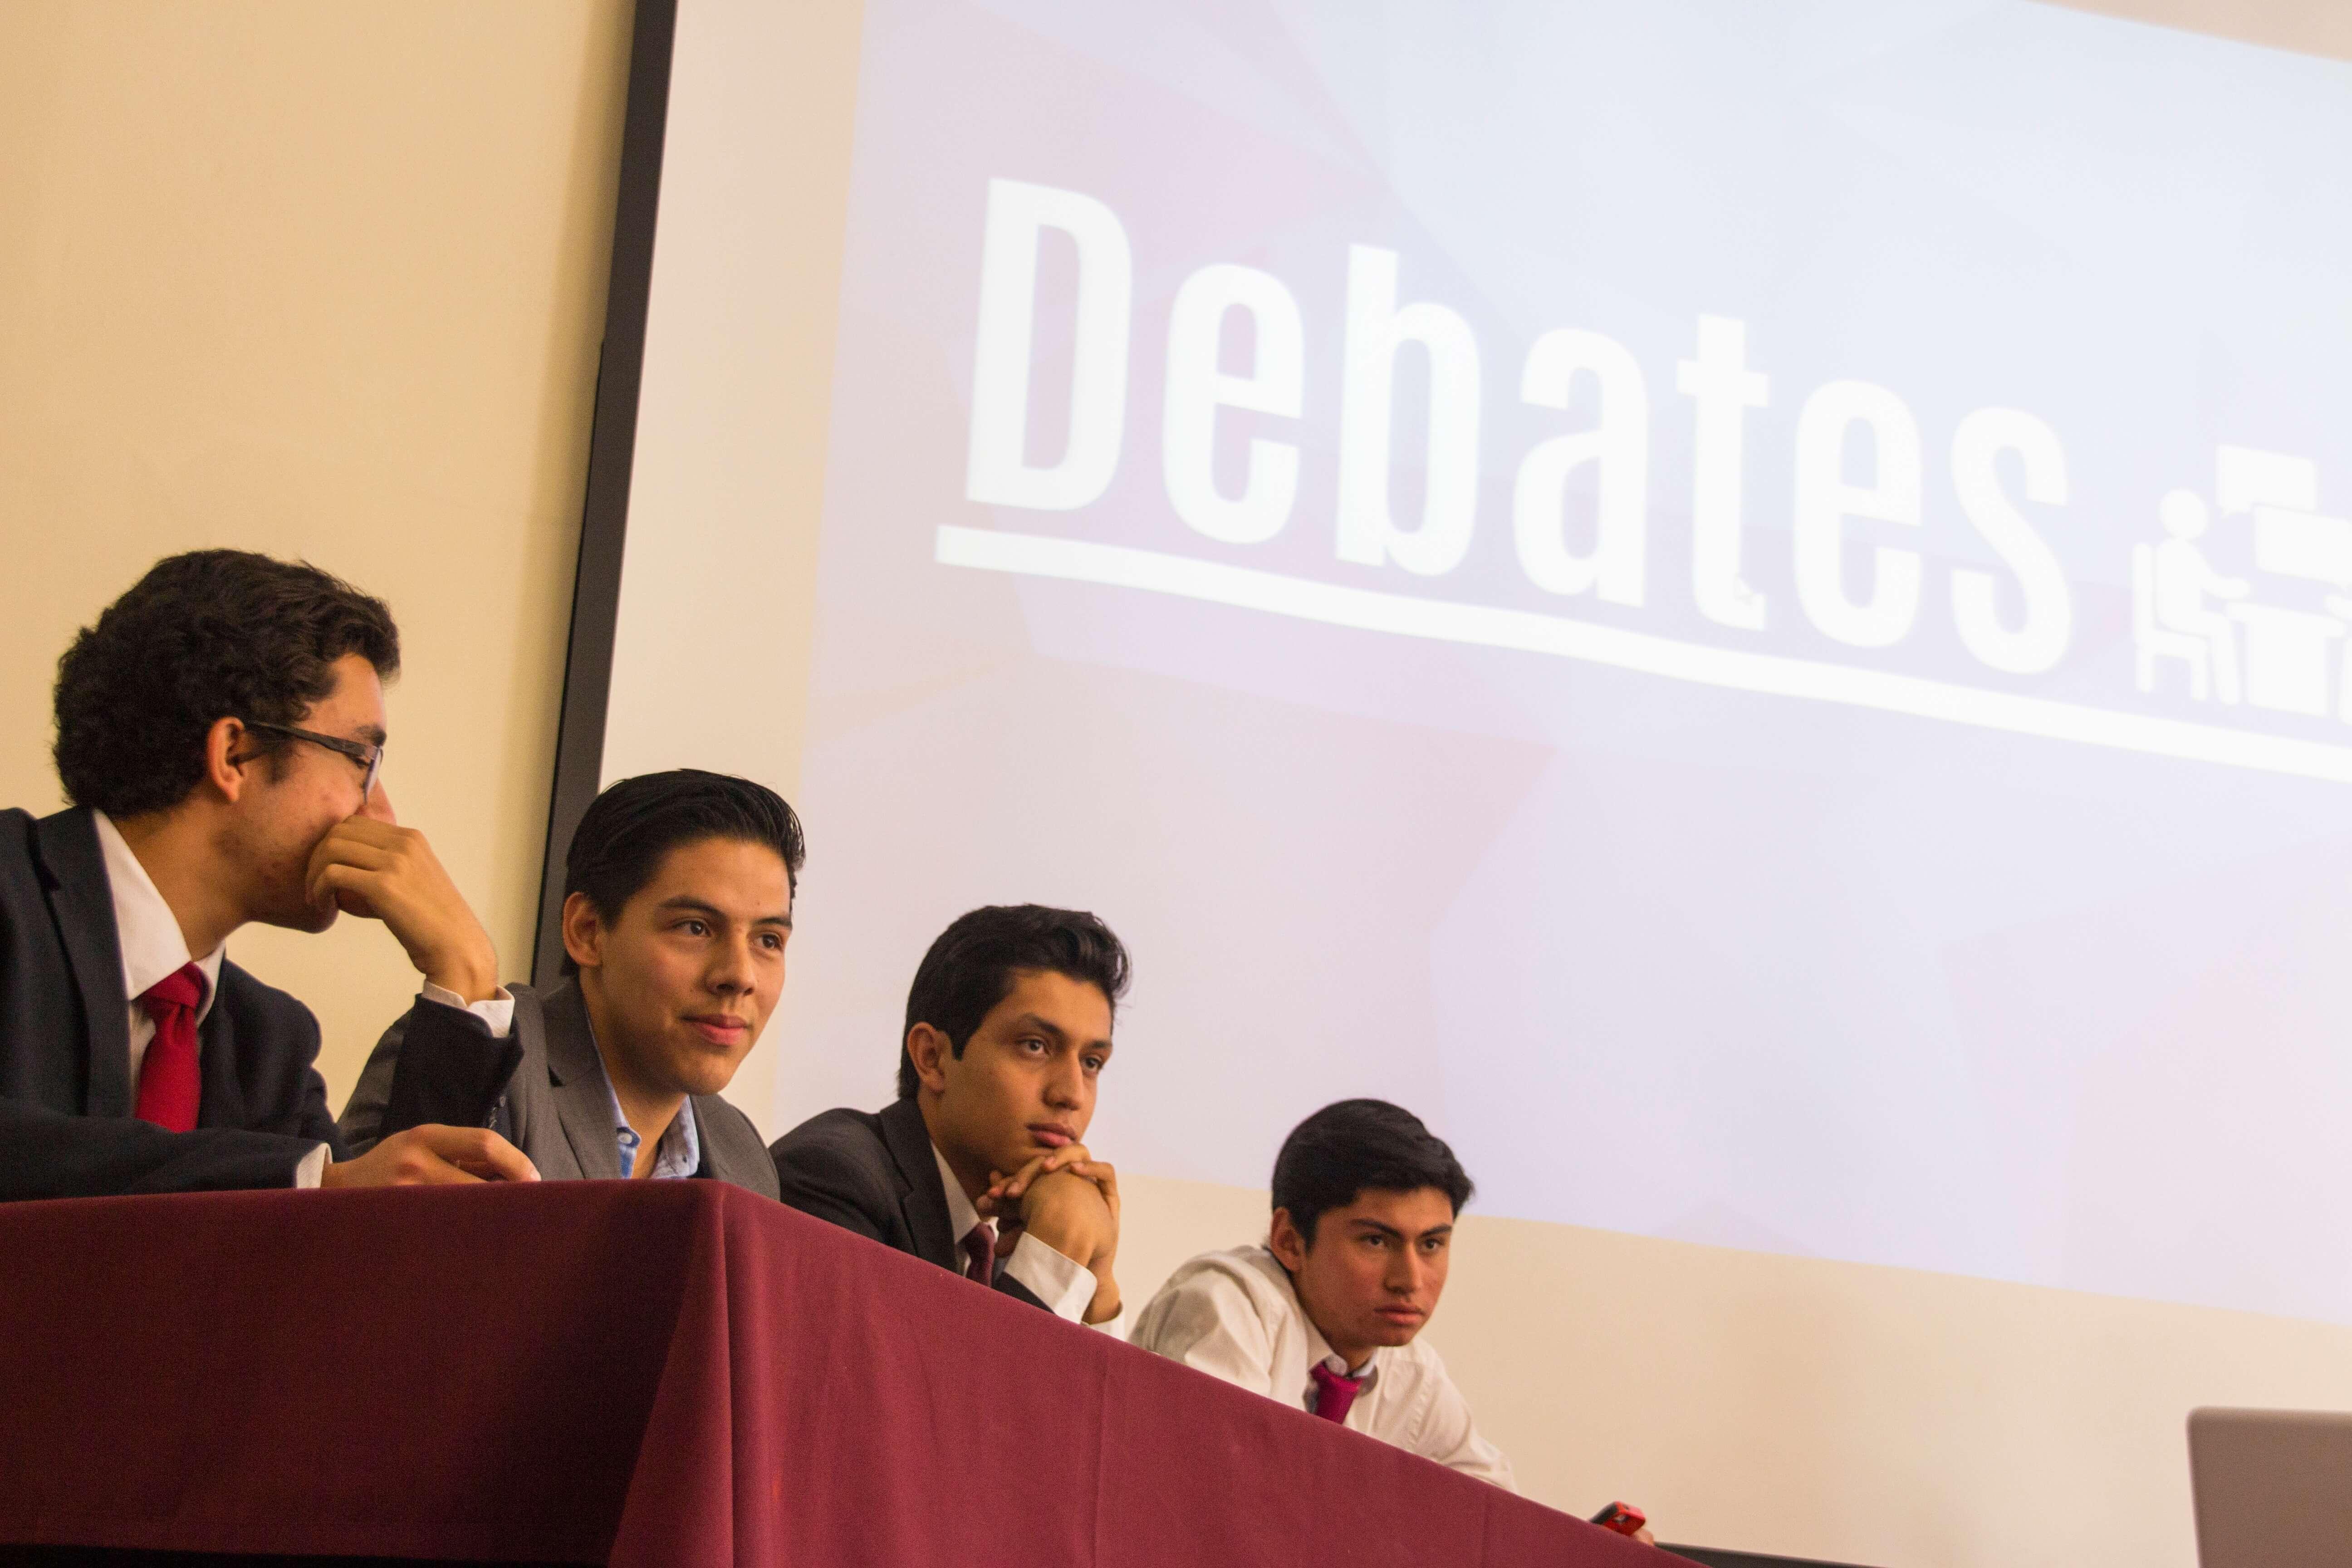 preparatorias-san-luis-potosi-maraton-debates-2017.jpg